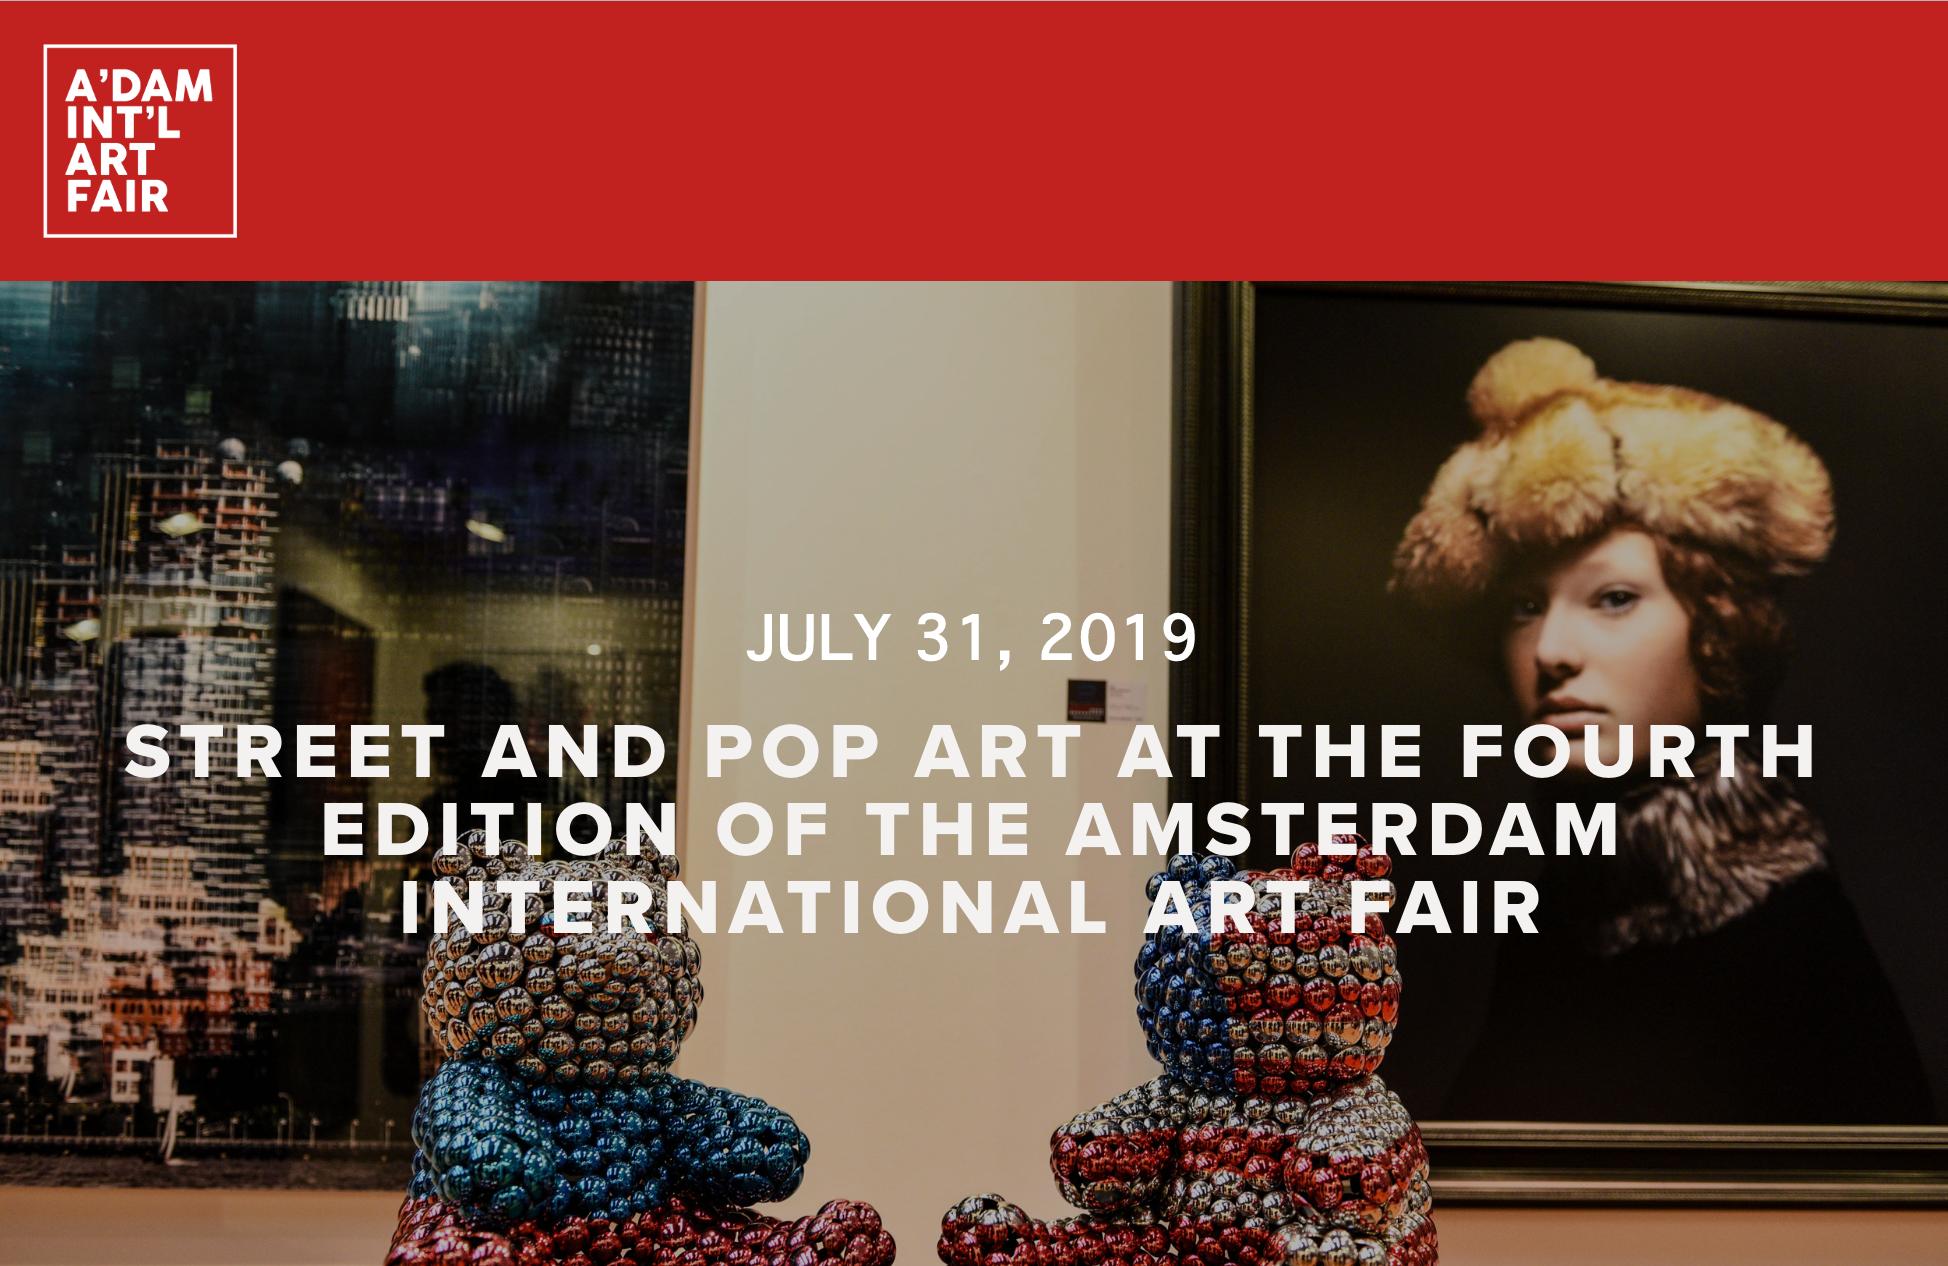 Image of the Adm intl Art fair and logo